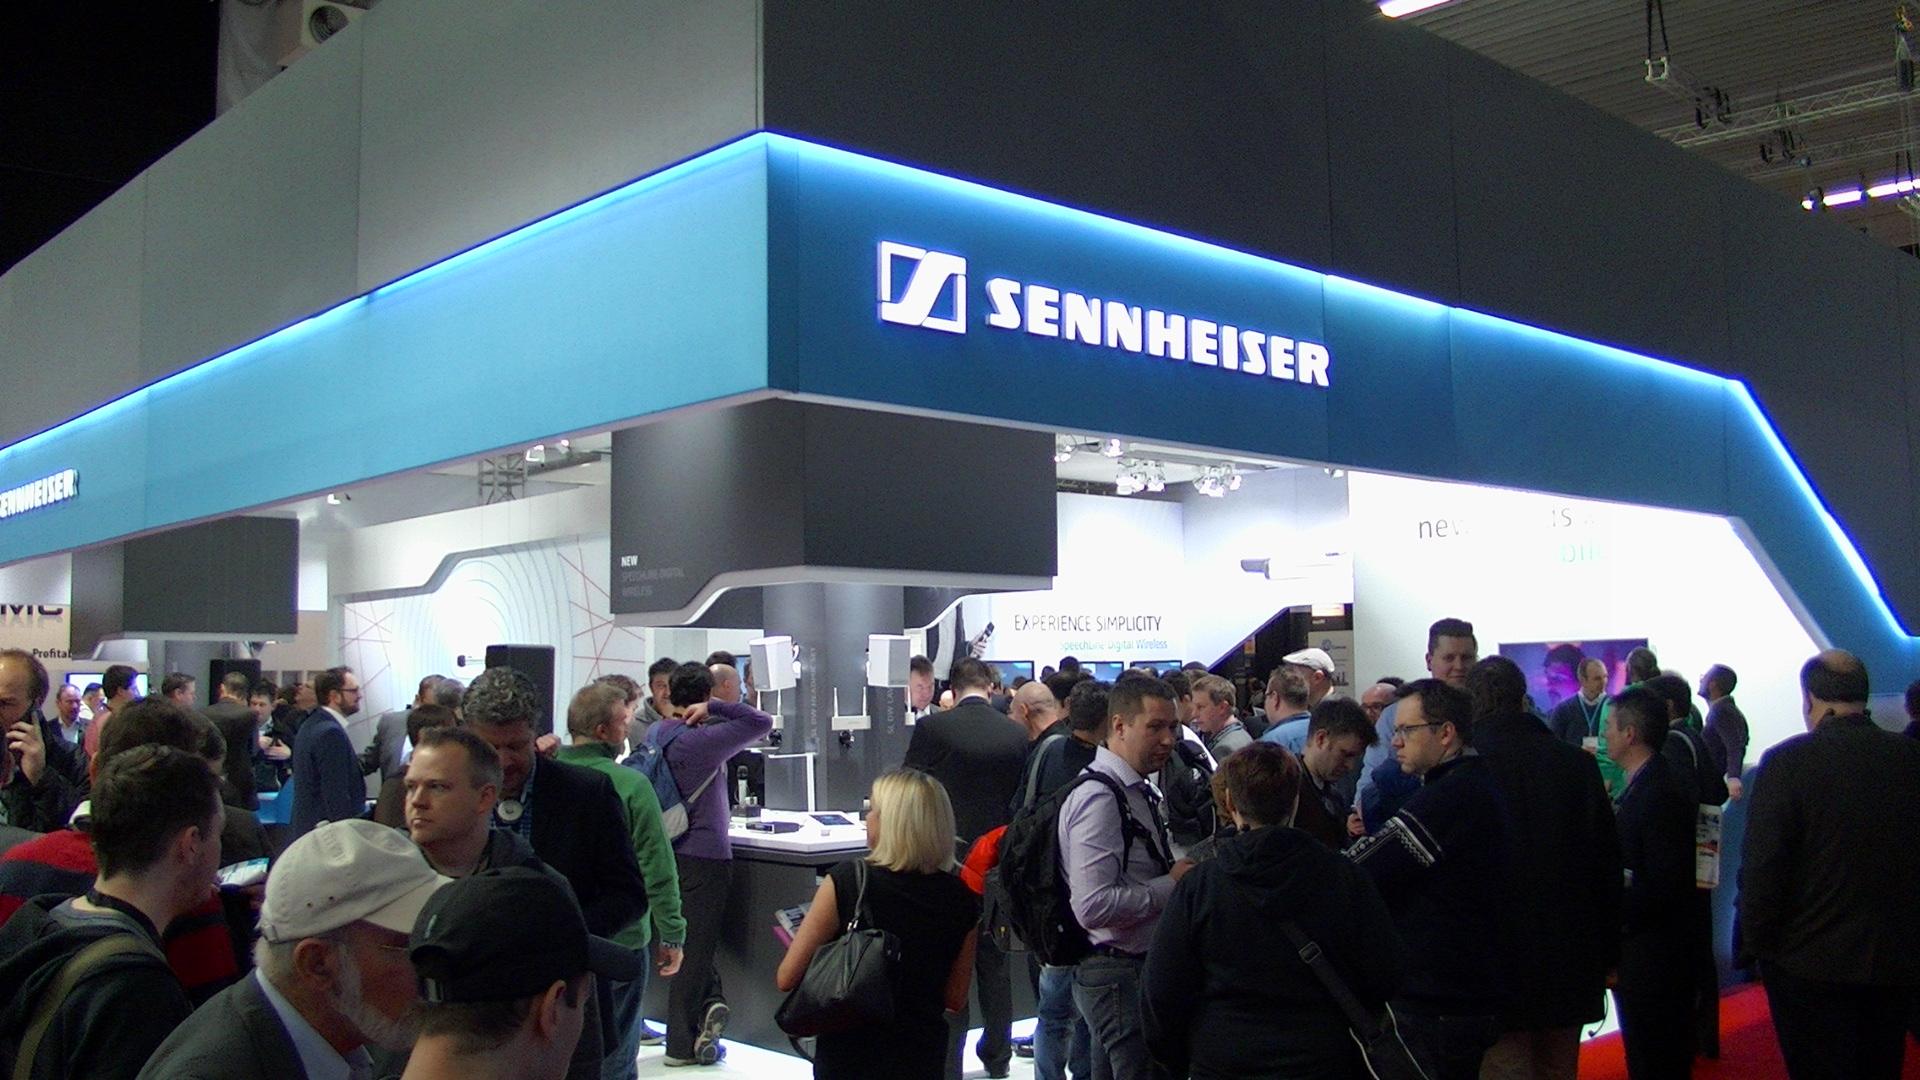 Sennheiser stand 01.JPG